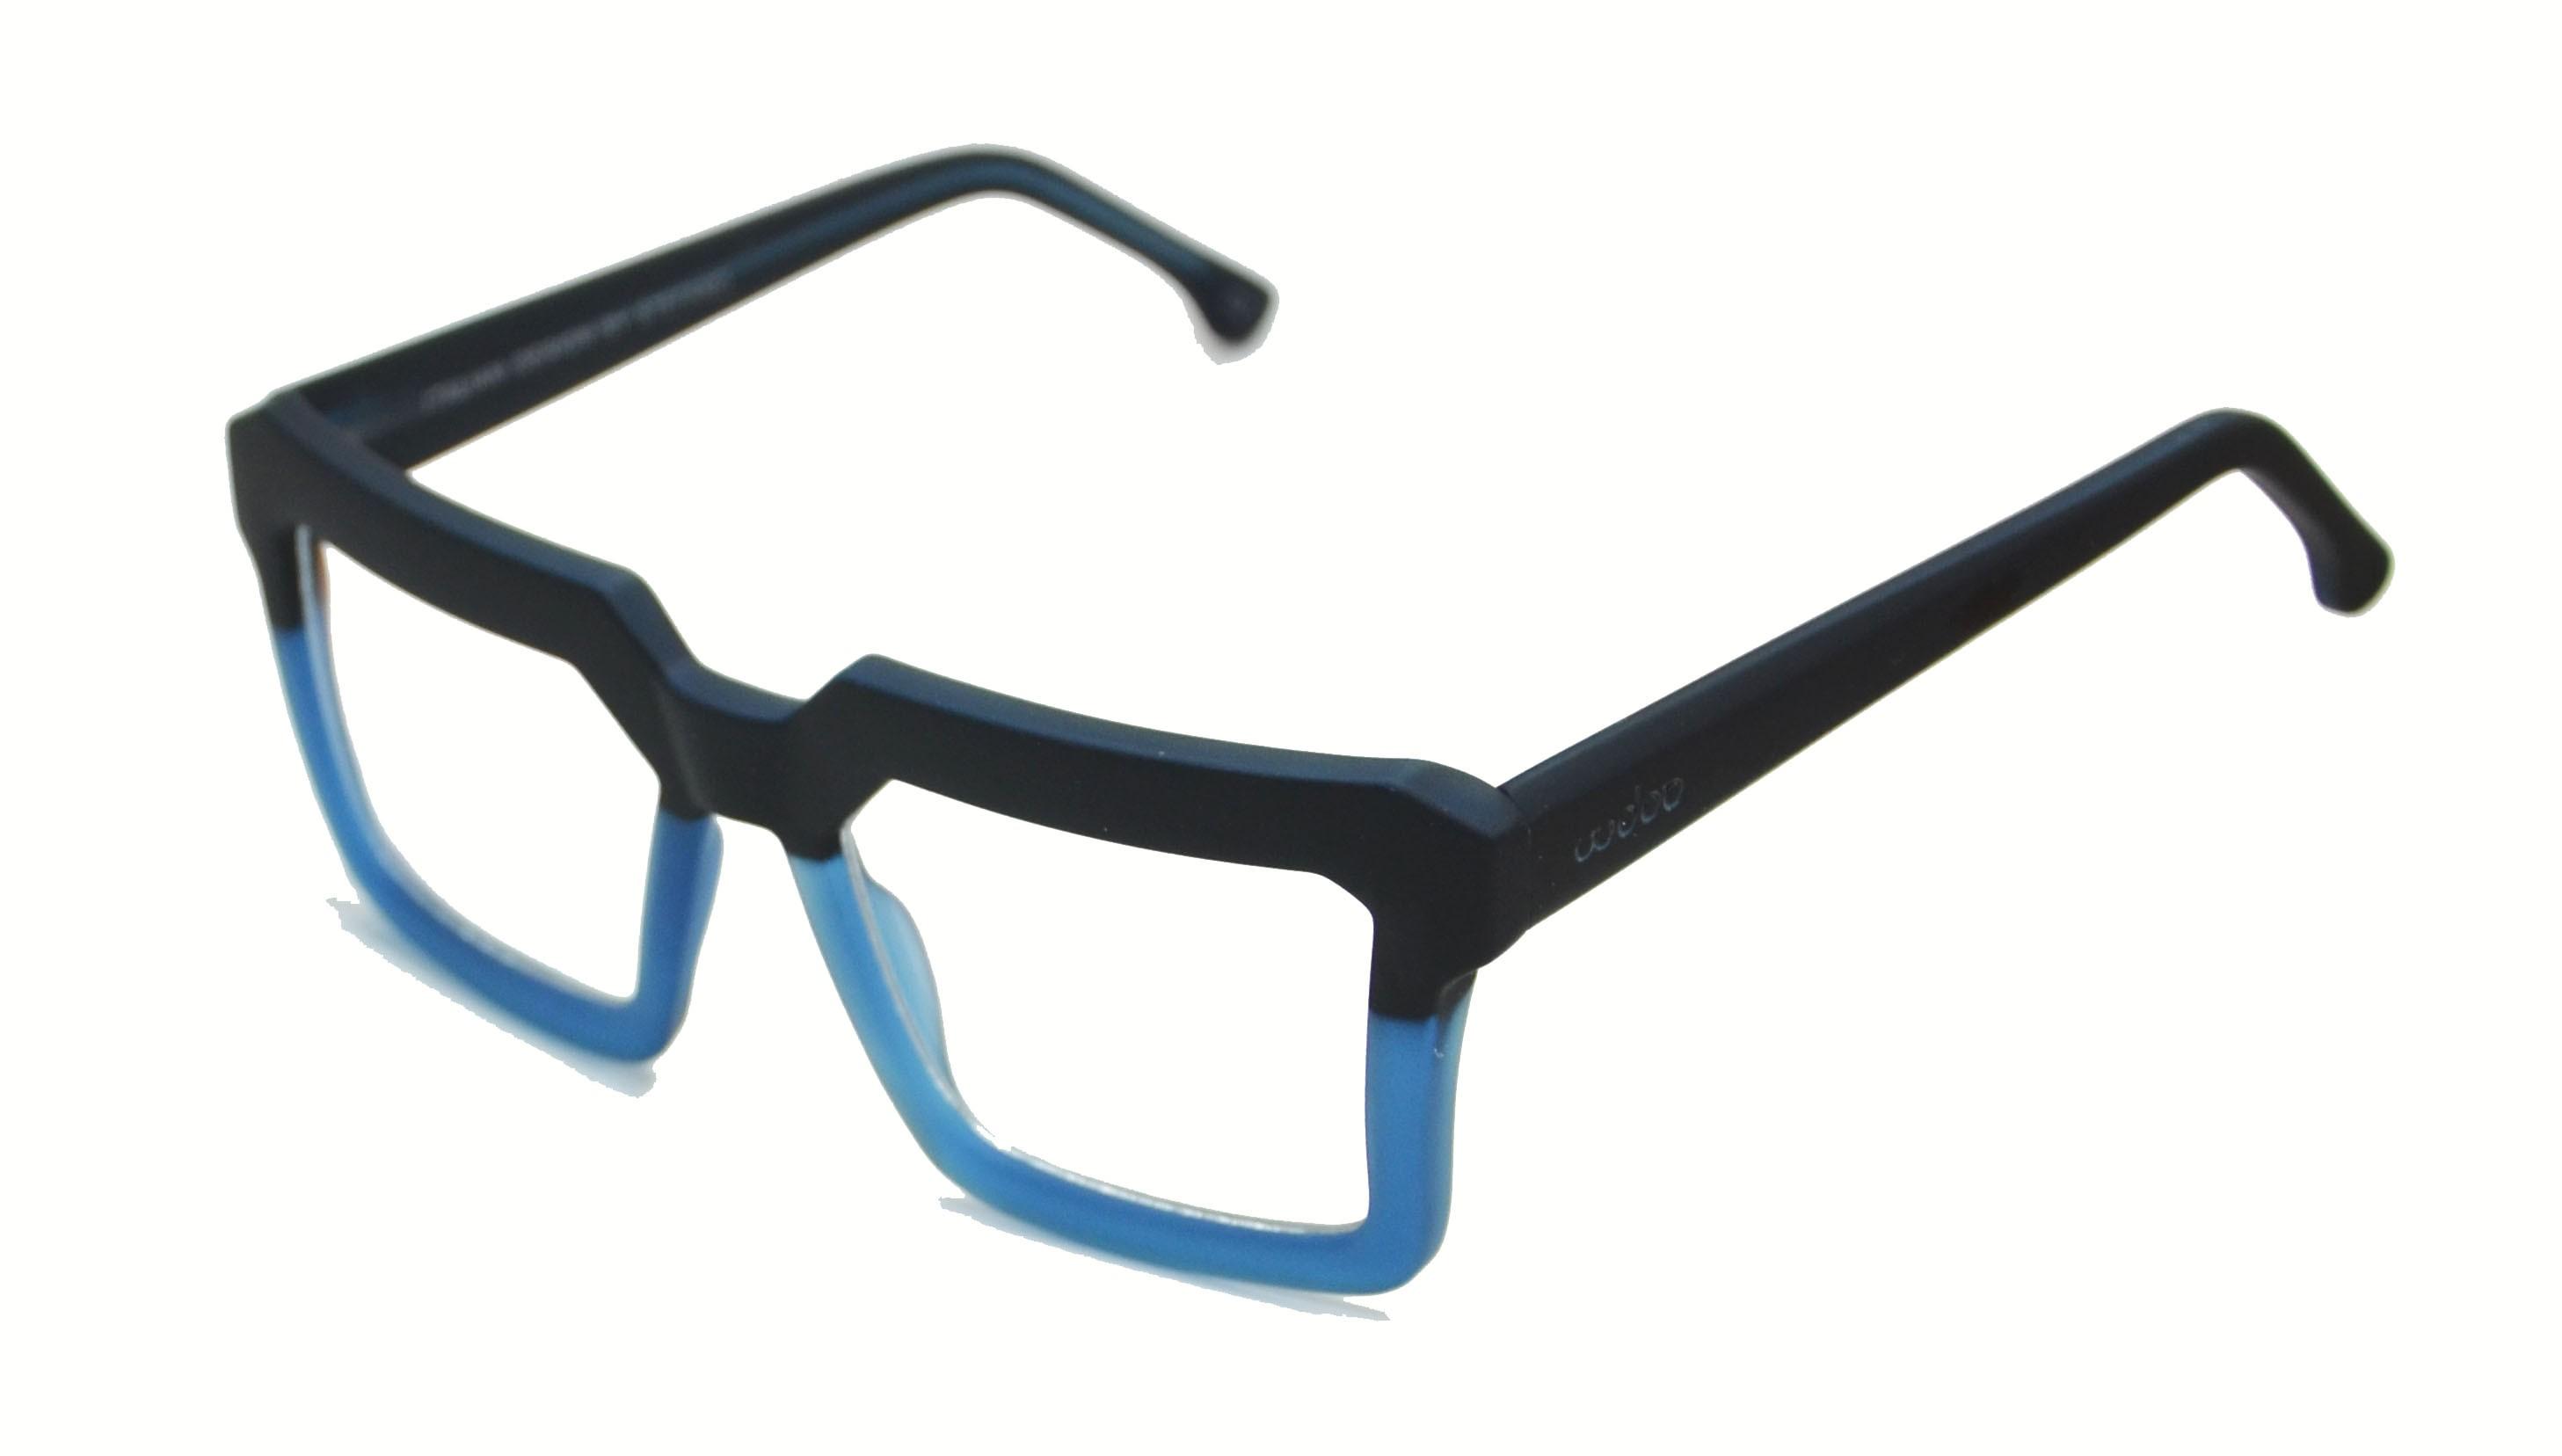 39412 (35414) C2 Black Blue